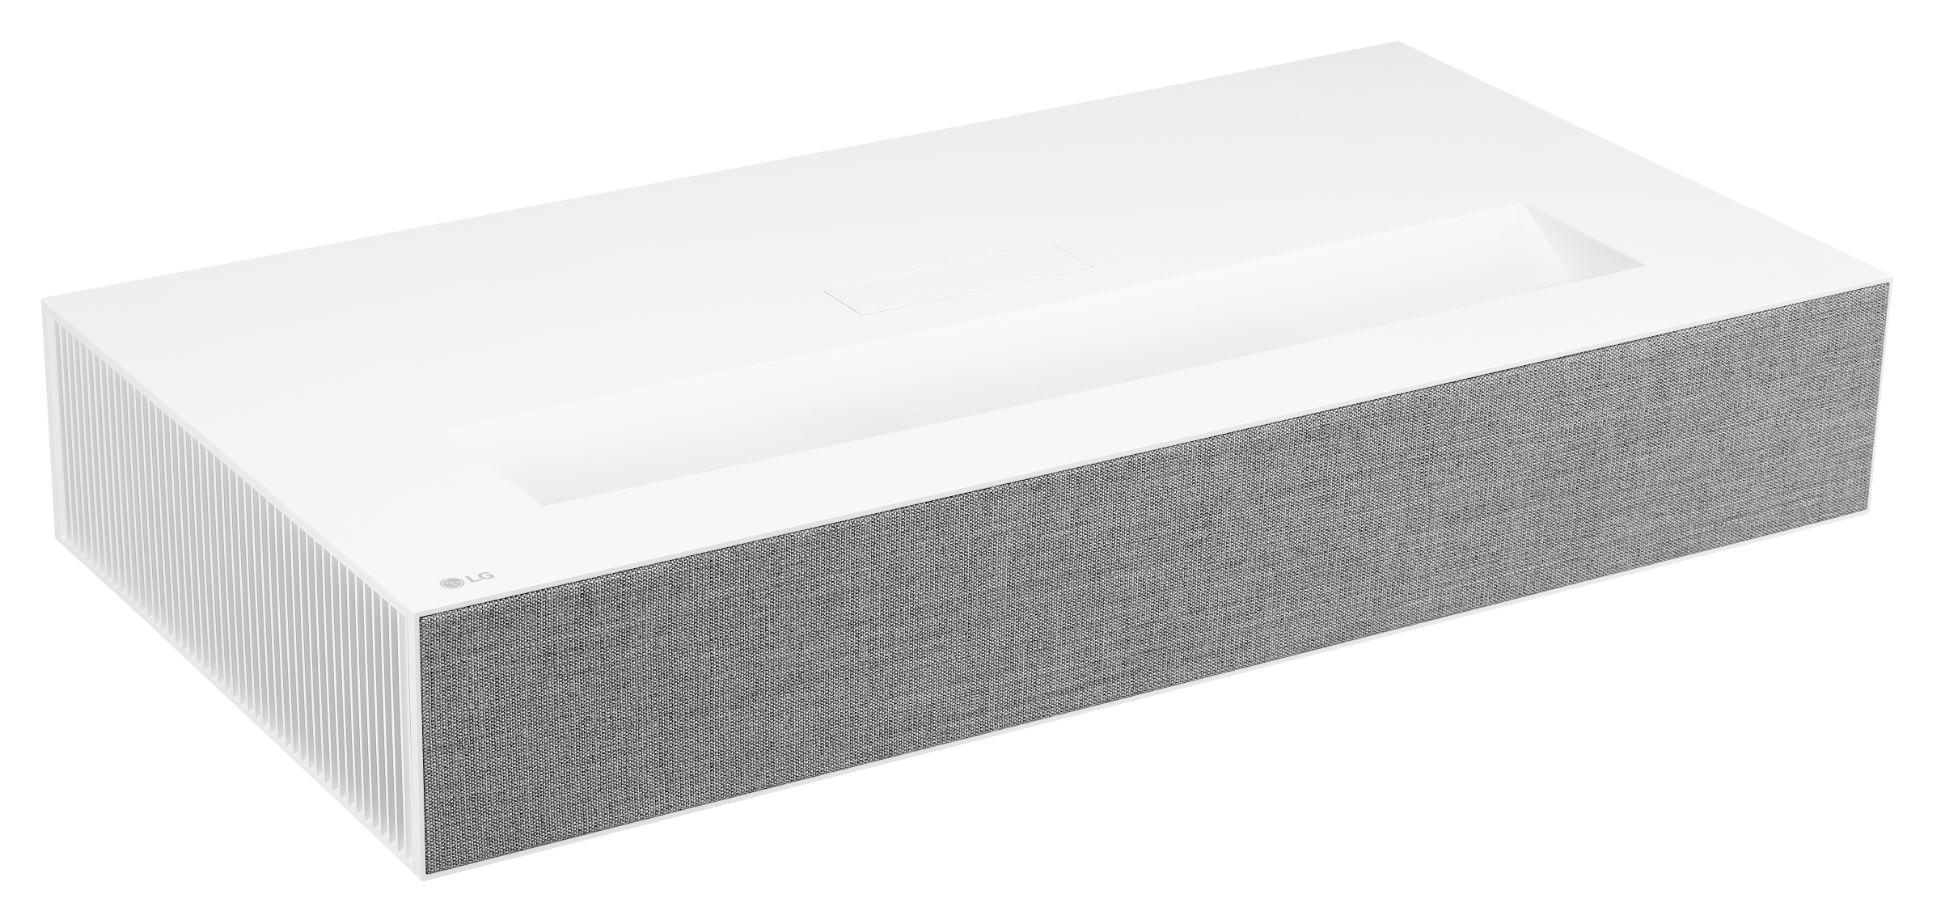 'LG 시네빔' 프로젝터 신제품 출시